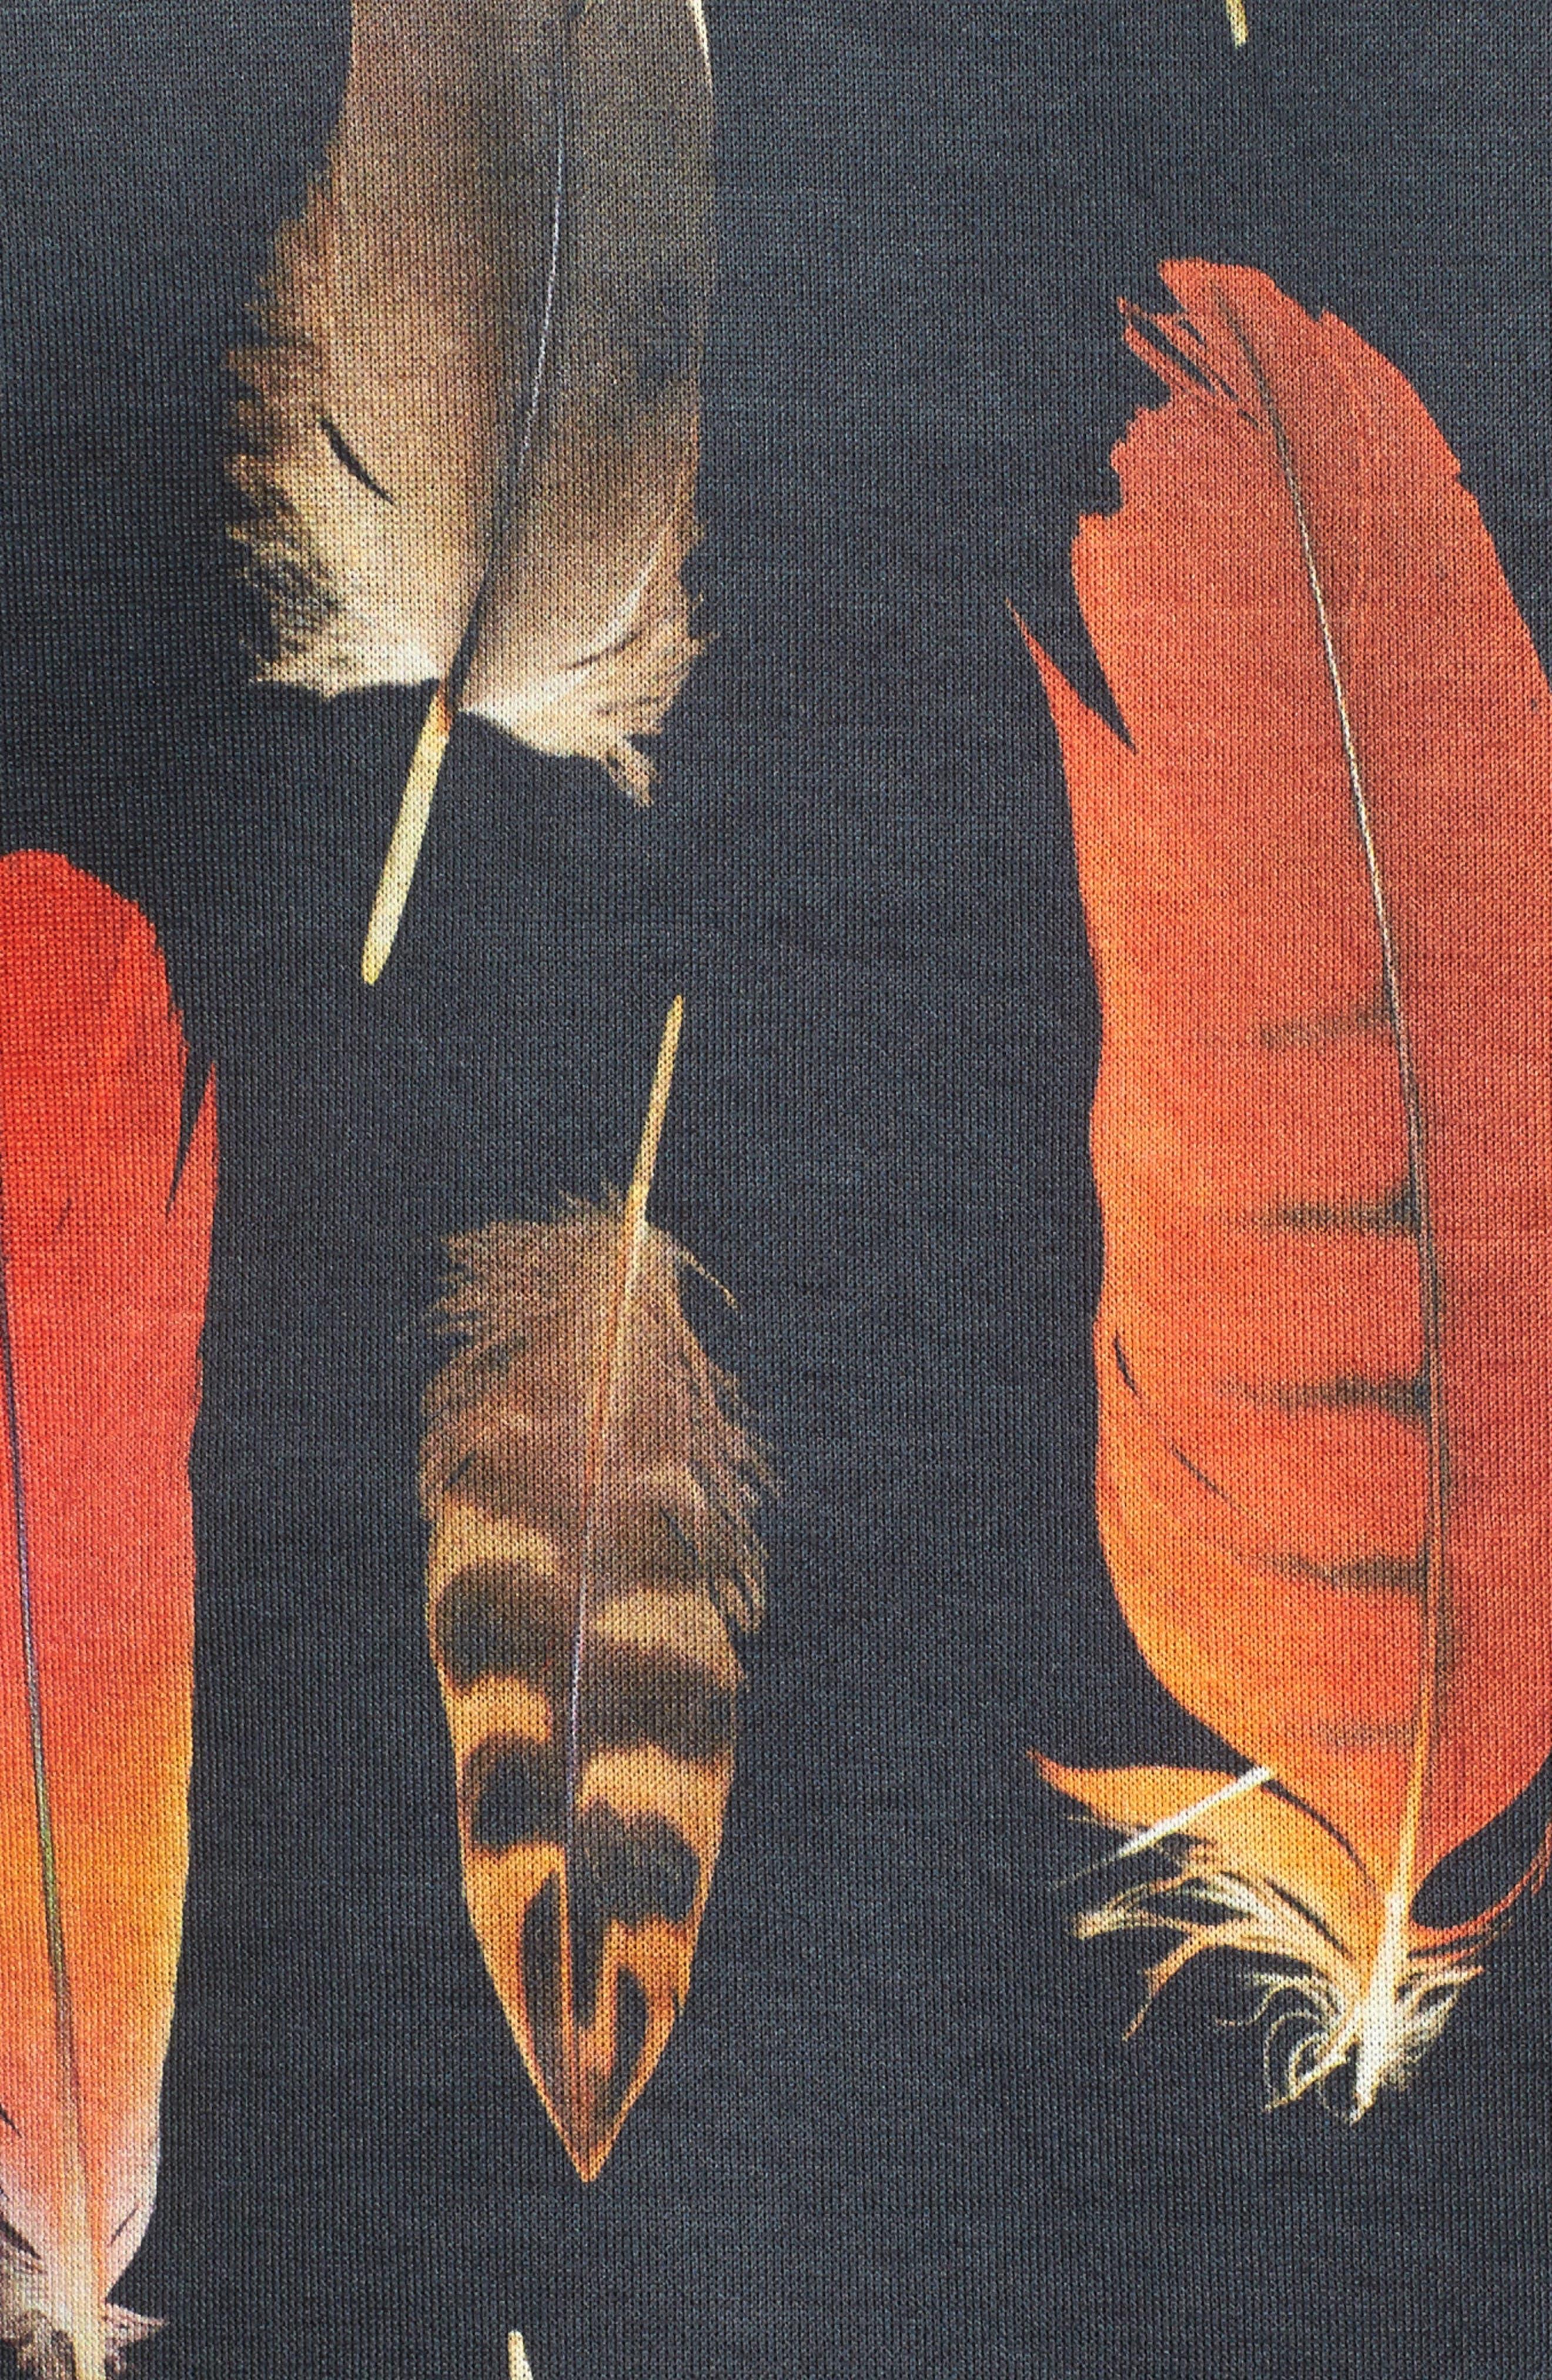 Feather Print T-Shirt,                             Alternate thumbnail 5, color,                             001